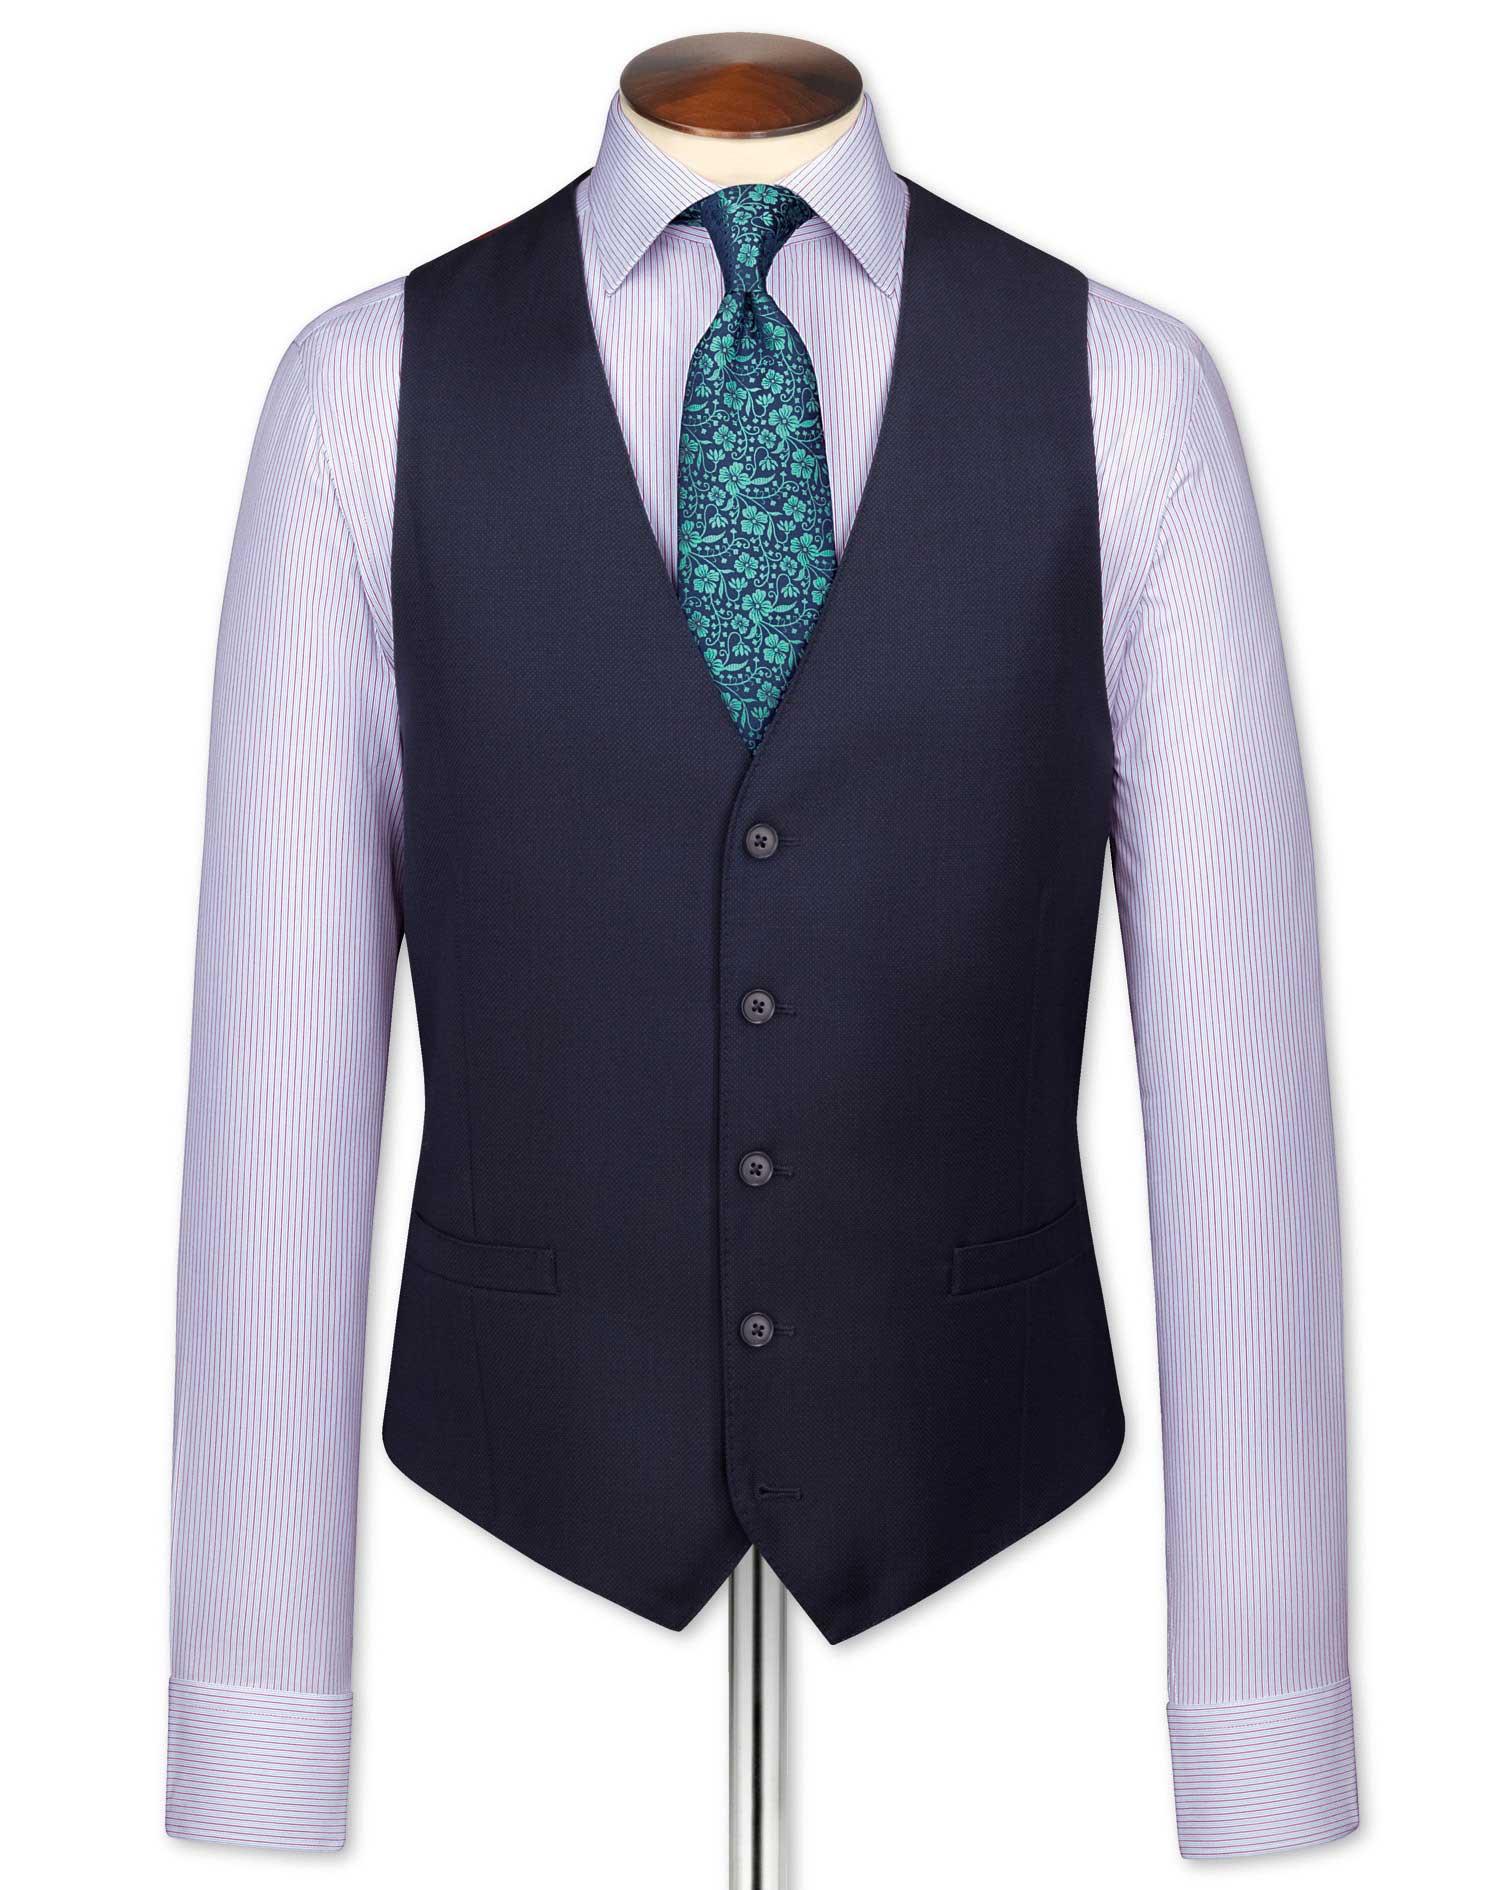 Navy Adjustable Fit Birdseye Travel Suit Wool Waistcoat Size w46 by Charles Tyrwhitt